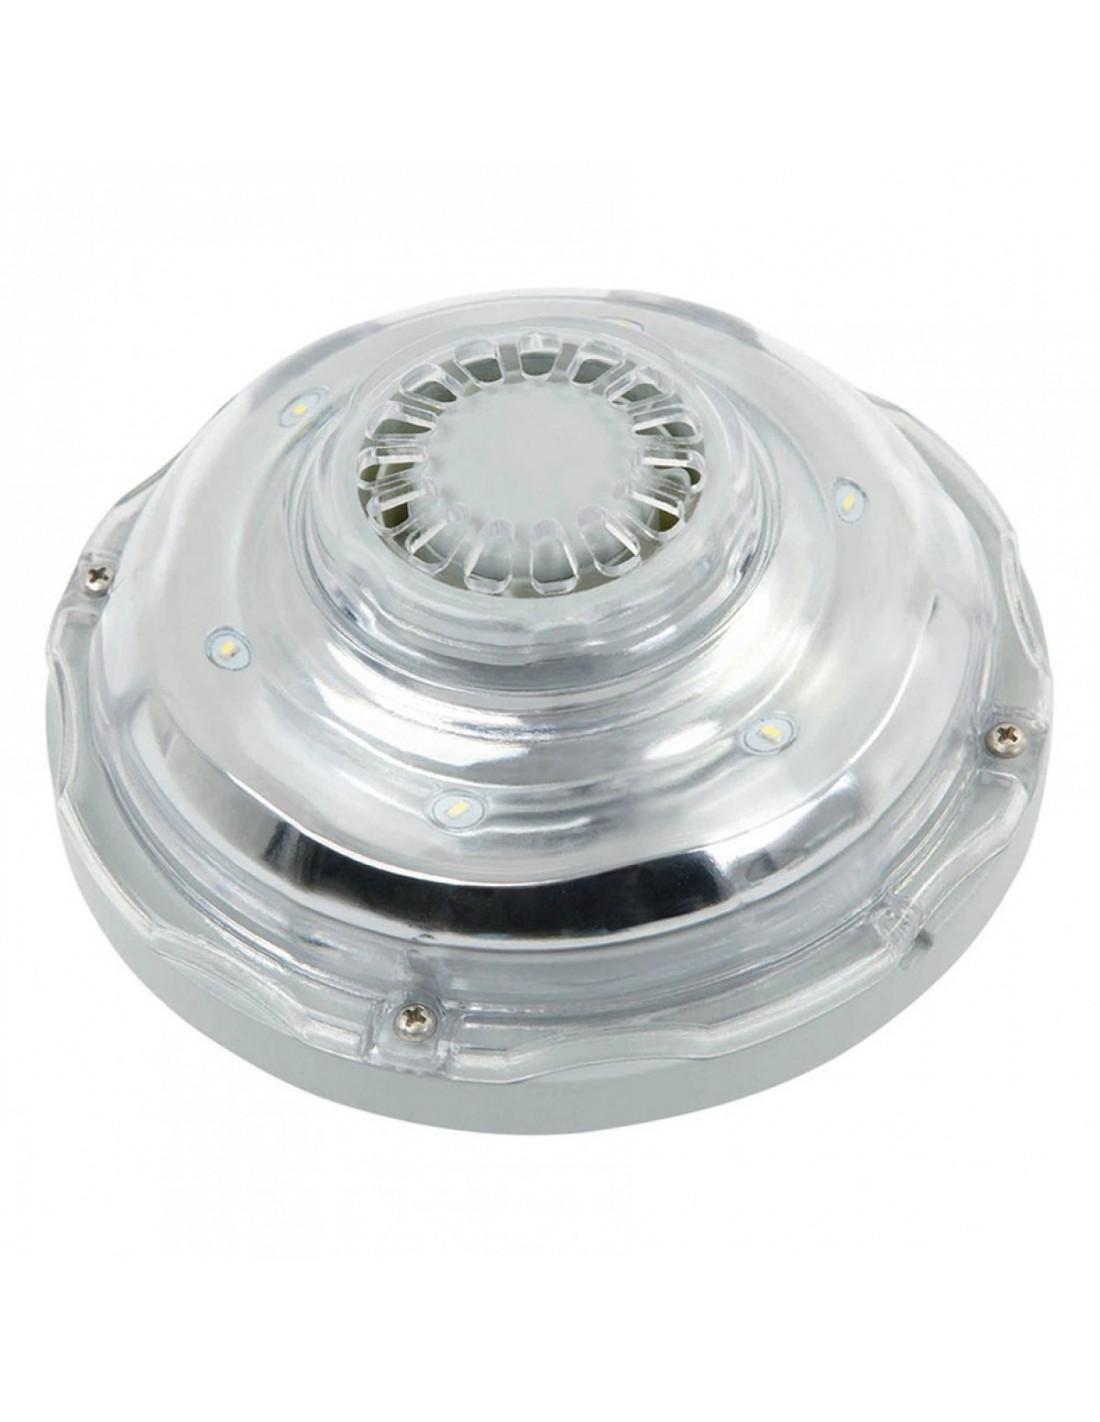 intex lampe led pour piscine connexion 38 mm hyper brico. Black Bedroom Furniture Sets. Home Design Ideas